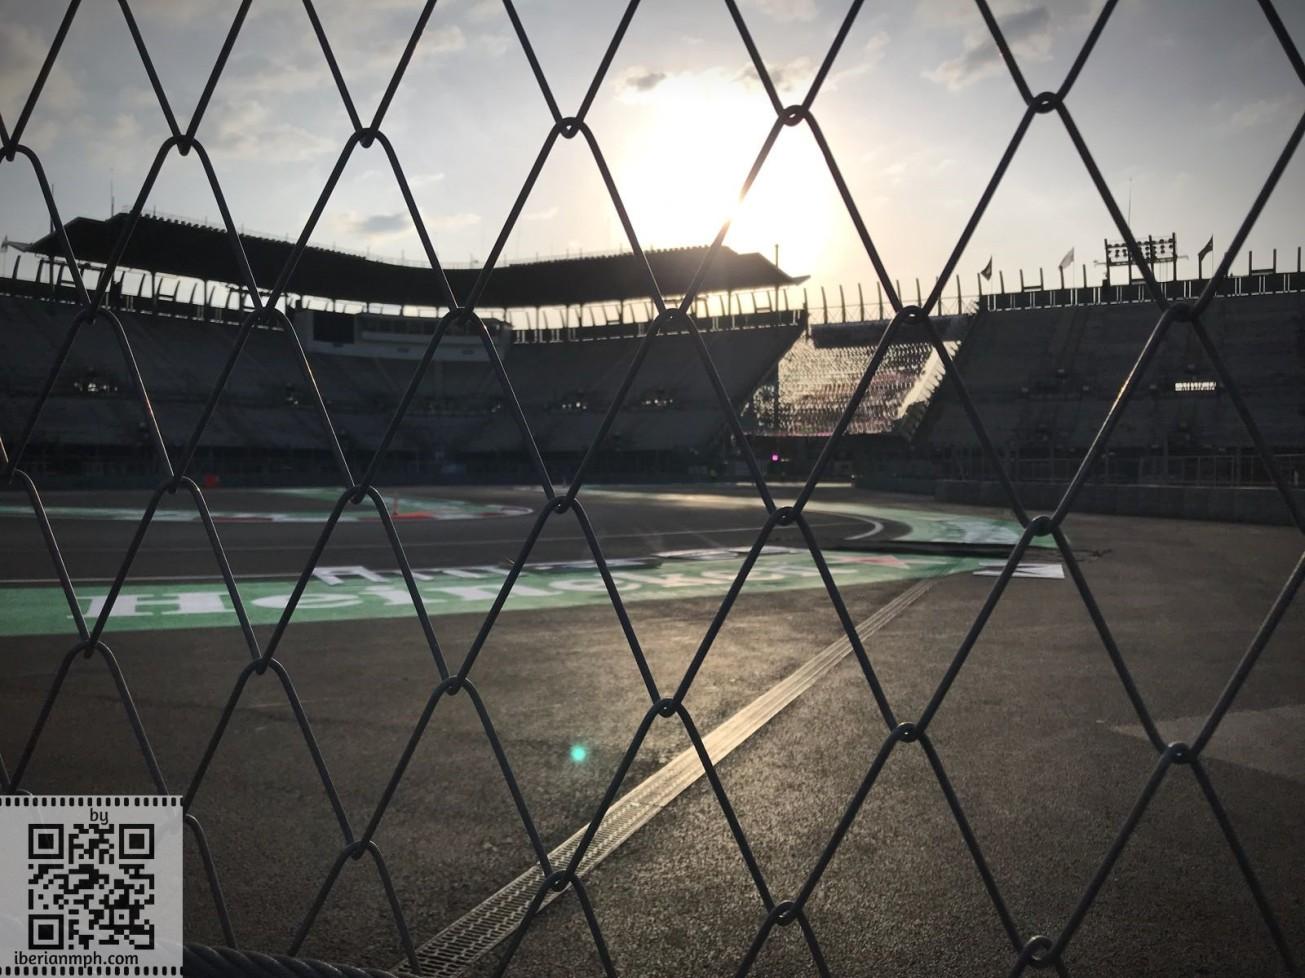 MexicoGP 2017 (3)